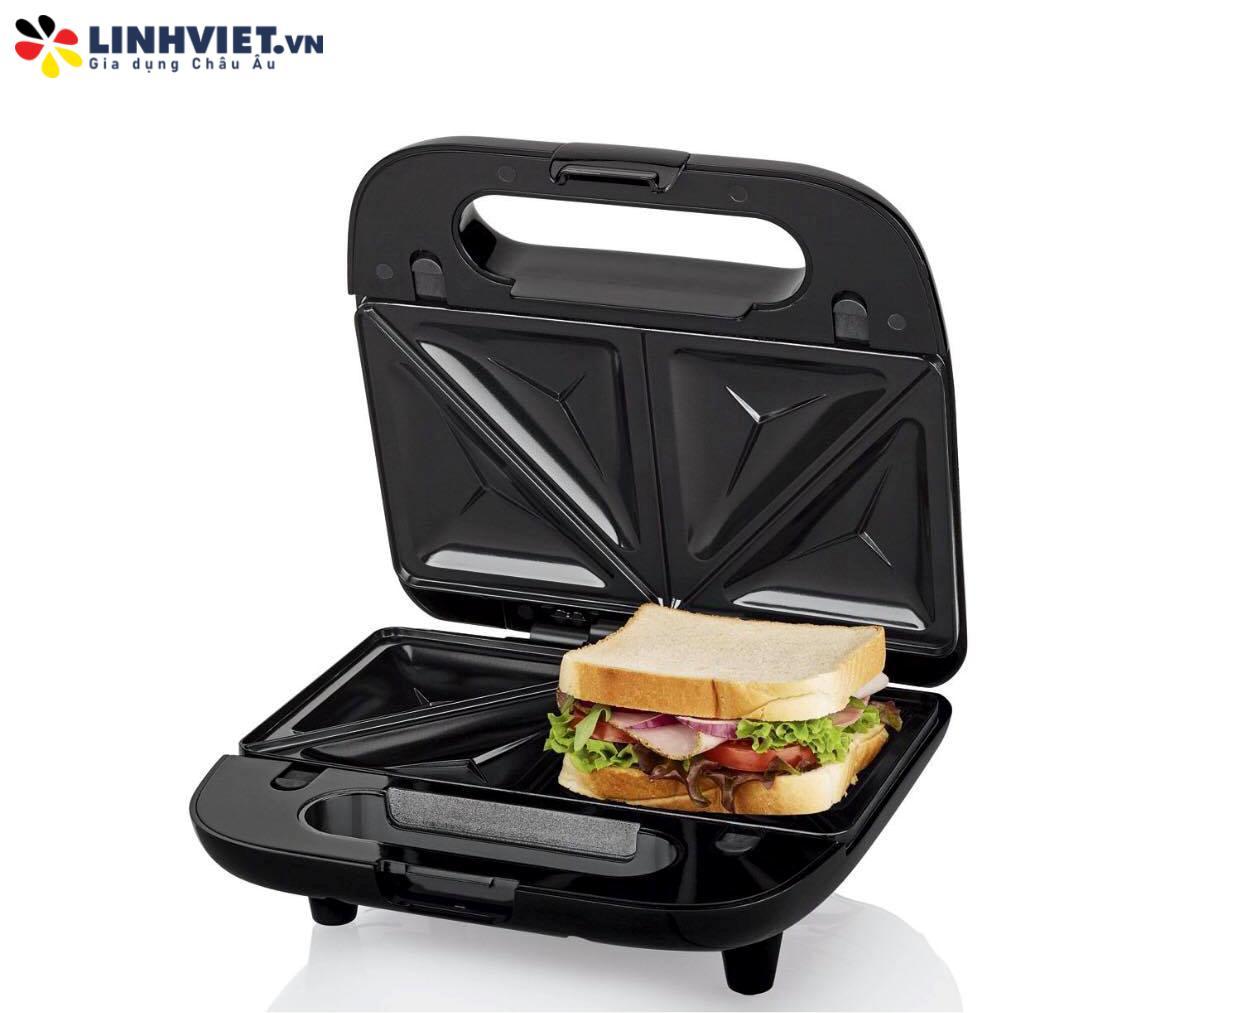 Máy làm bánh sandwich 3in1 SilverCrest SSWM750WC3